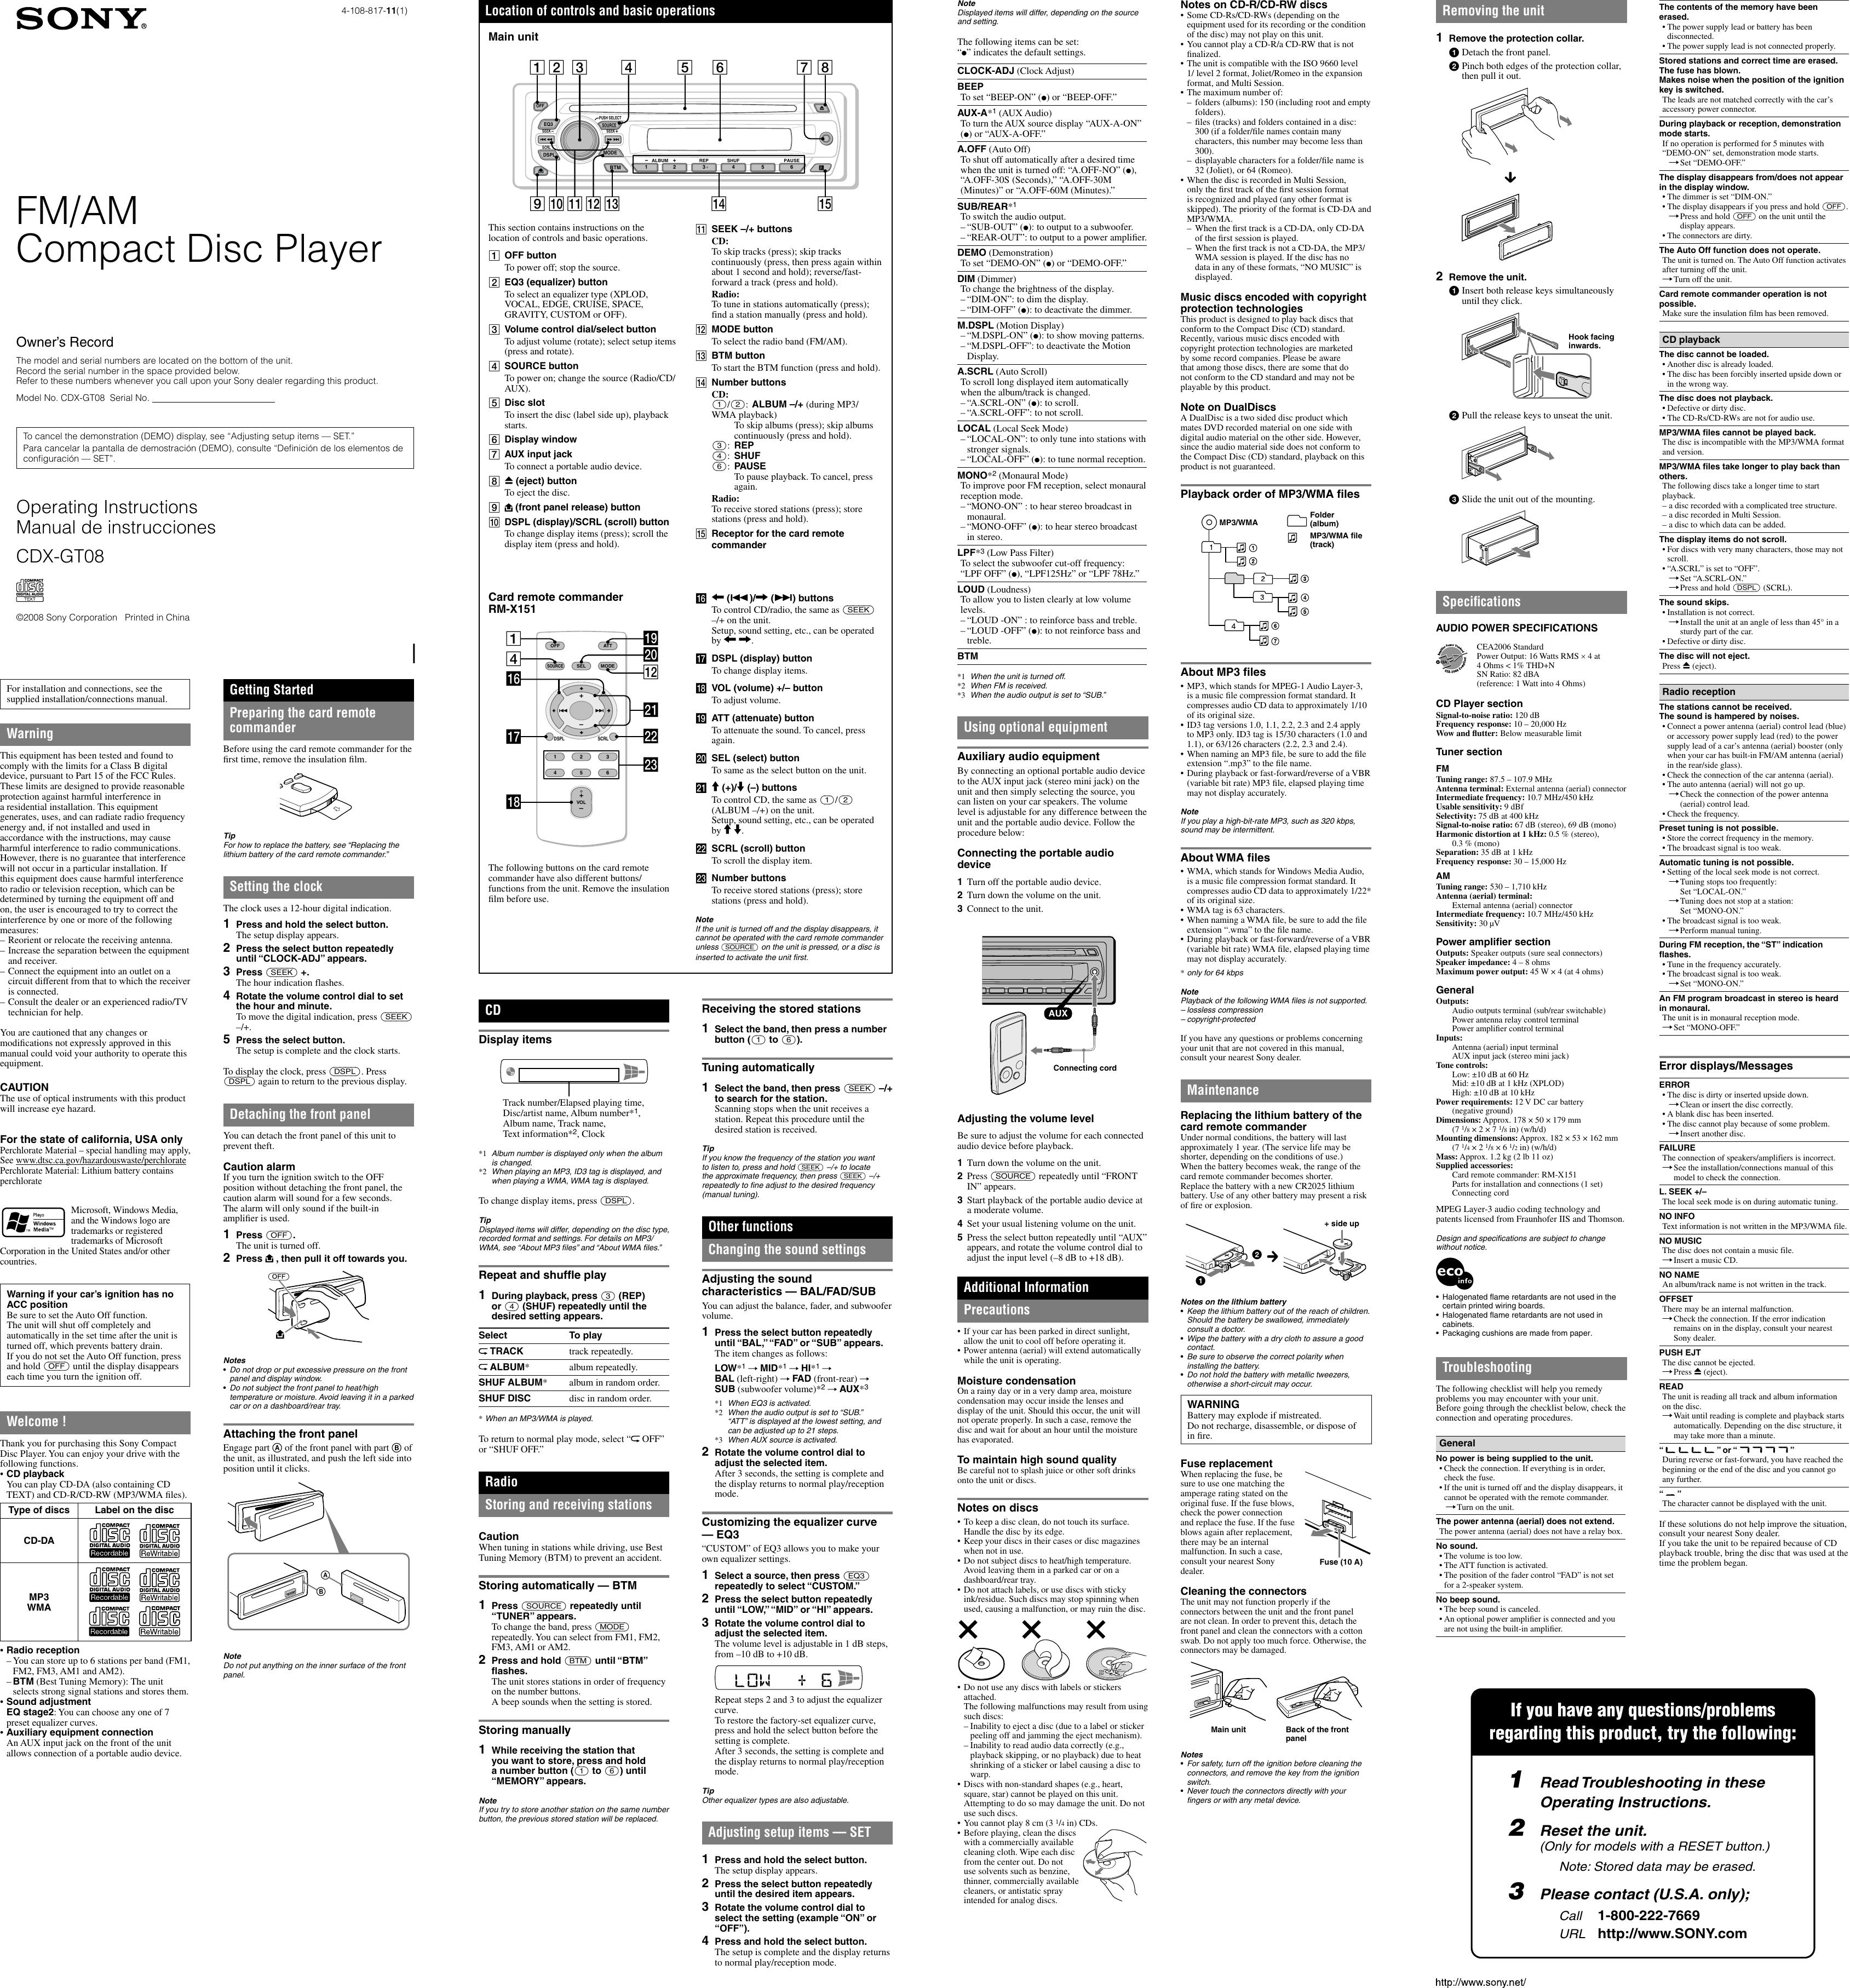 sony xplod wiring diagram cdx gt08 wiring diagramsony cdx gt08 operating instructionspage 1 of 2 sony sony cdx gt08 operating instructions